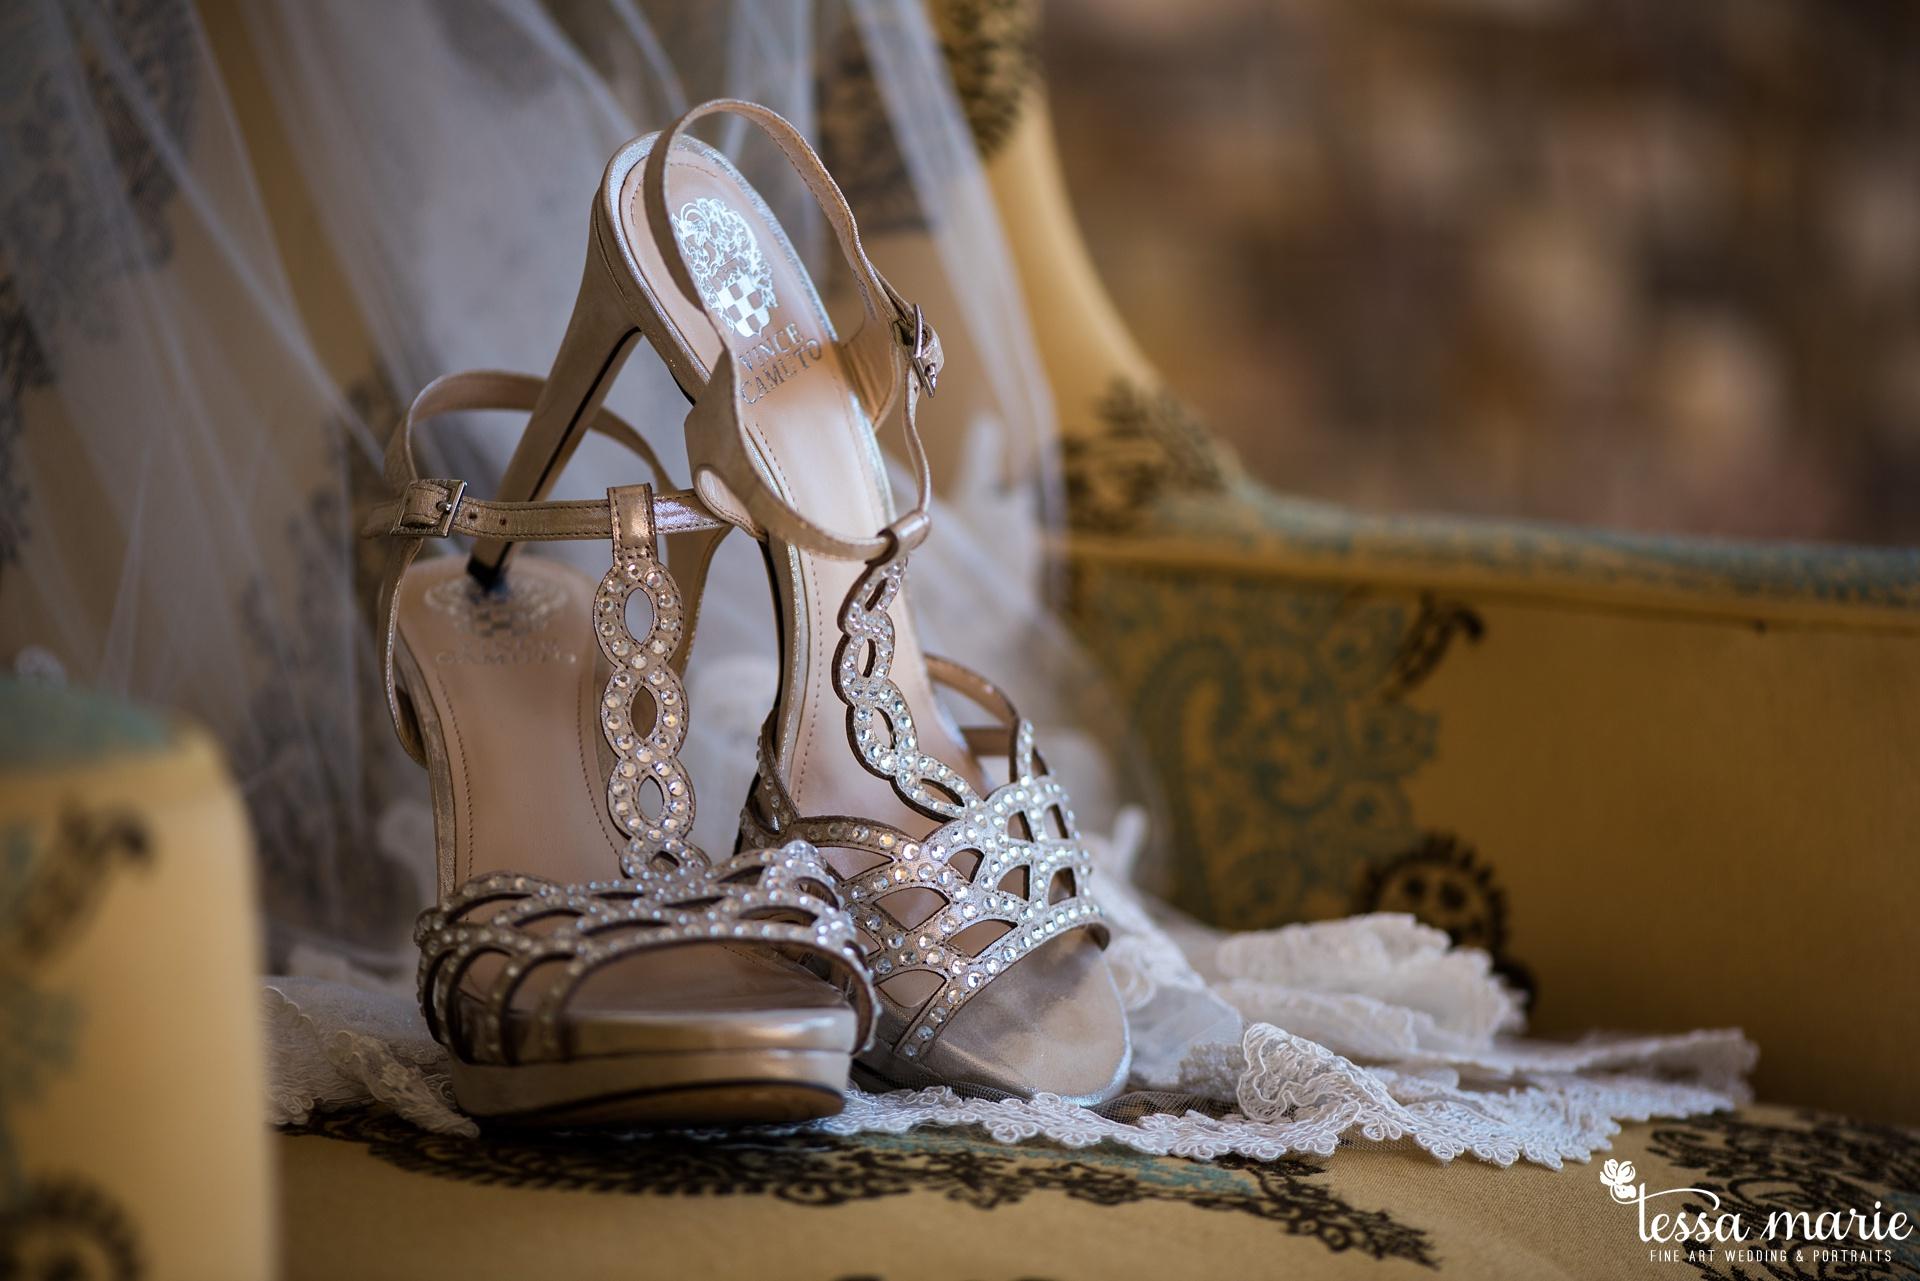 tessa_marie_legacy_moments_storytelling_candid_emotionally_driven_wedding_photographer_atlanta_wedding_photography_st_ives_country_club_wedding_boukates_bridals_by_lori_0031